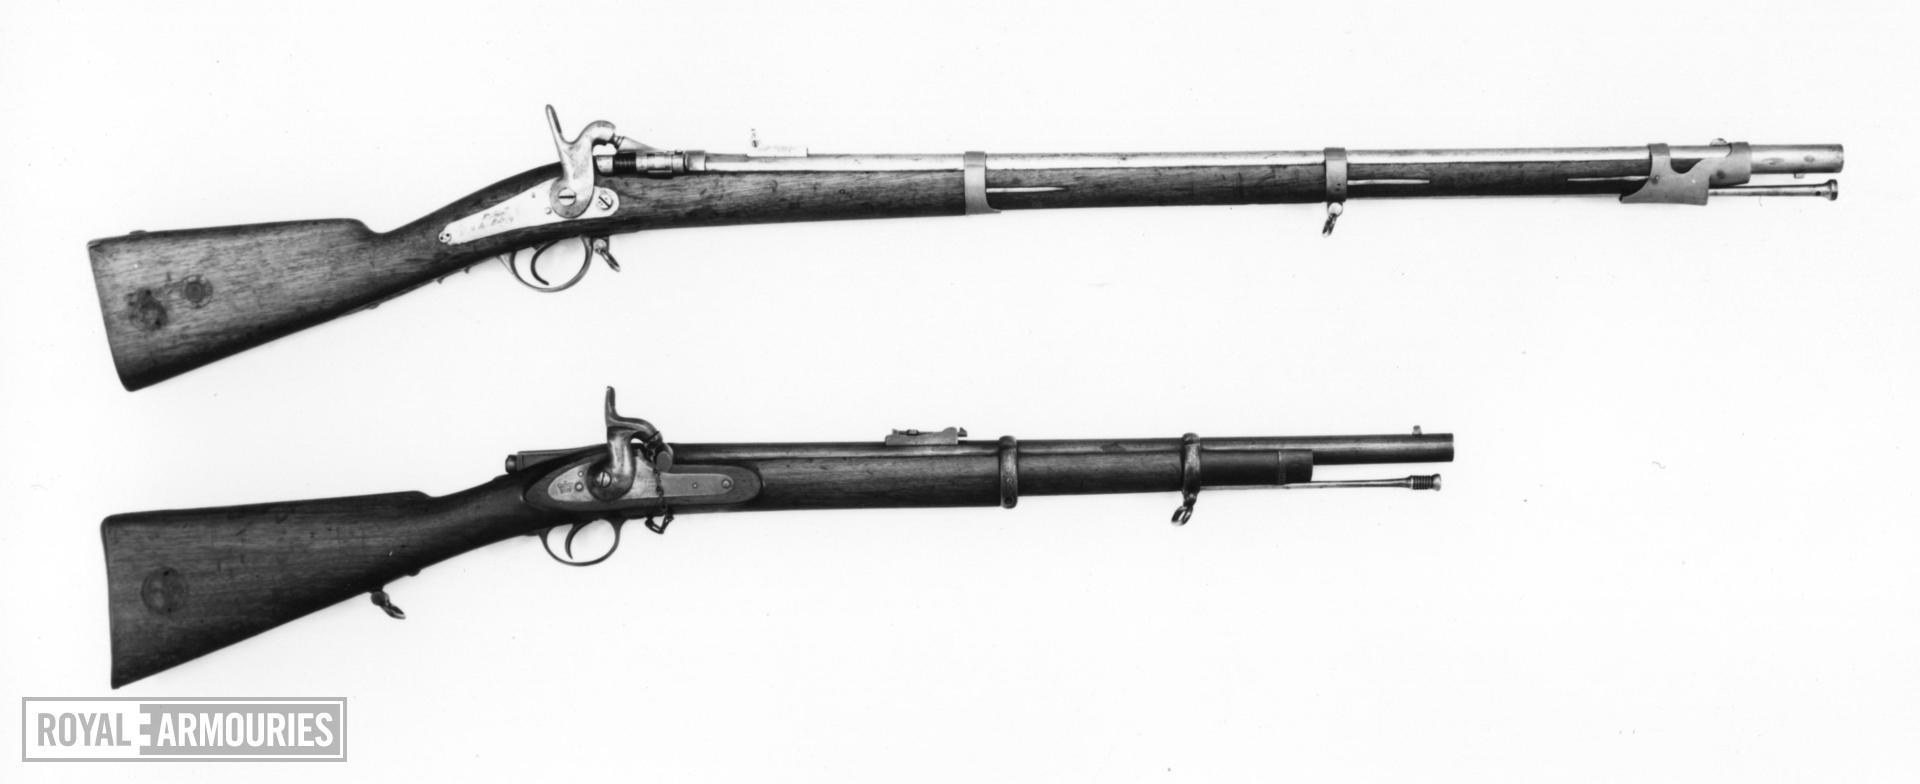 Centrefire breech-loading rifle - Model 1857